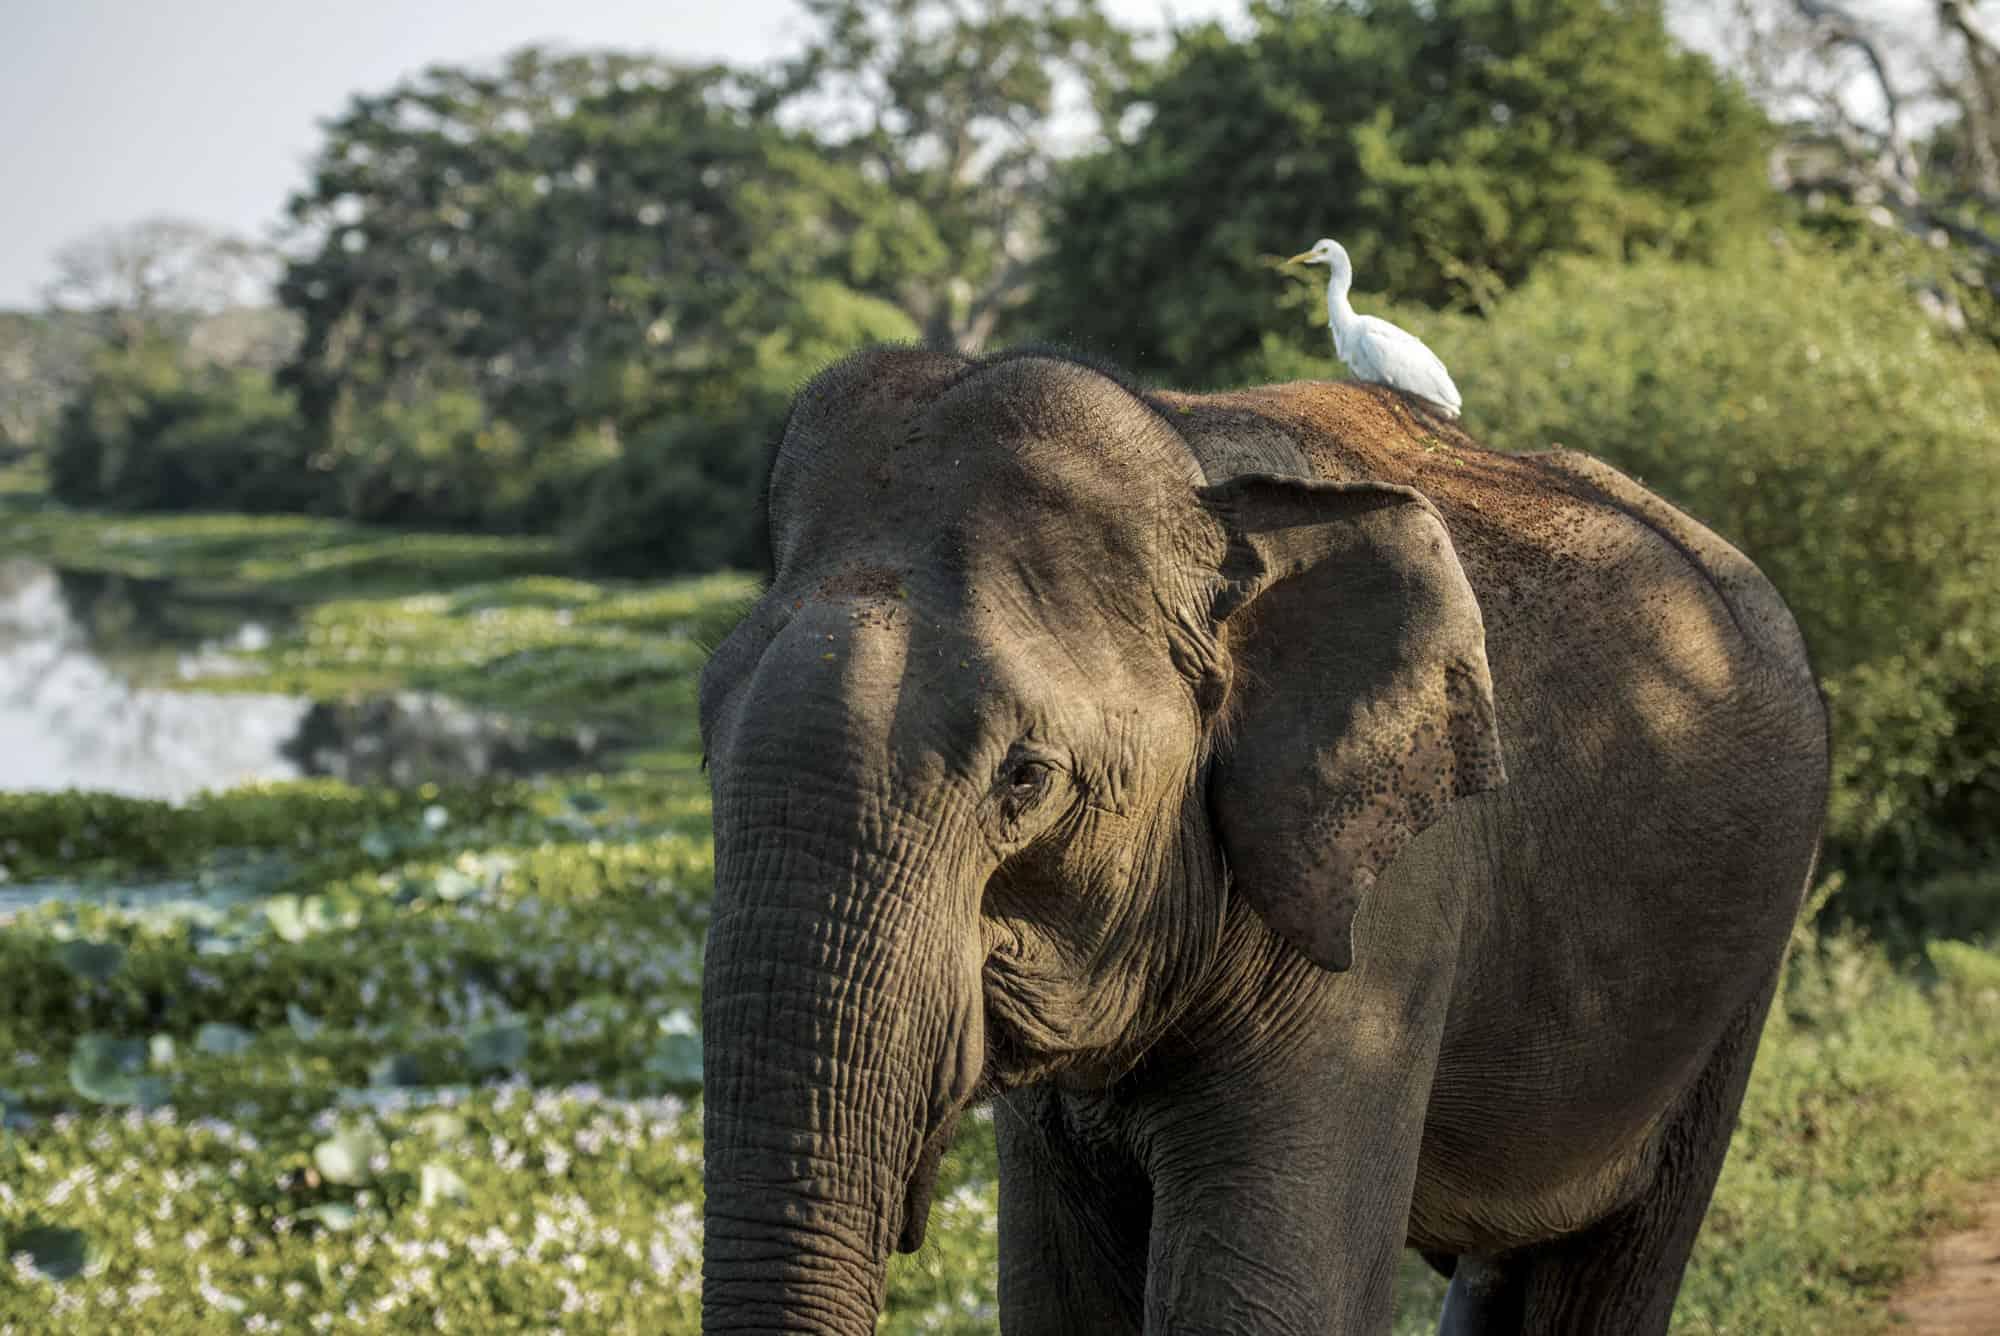 Asian elephant in Sri Lanka with a cattle egret sat on it